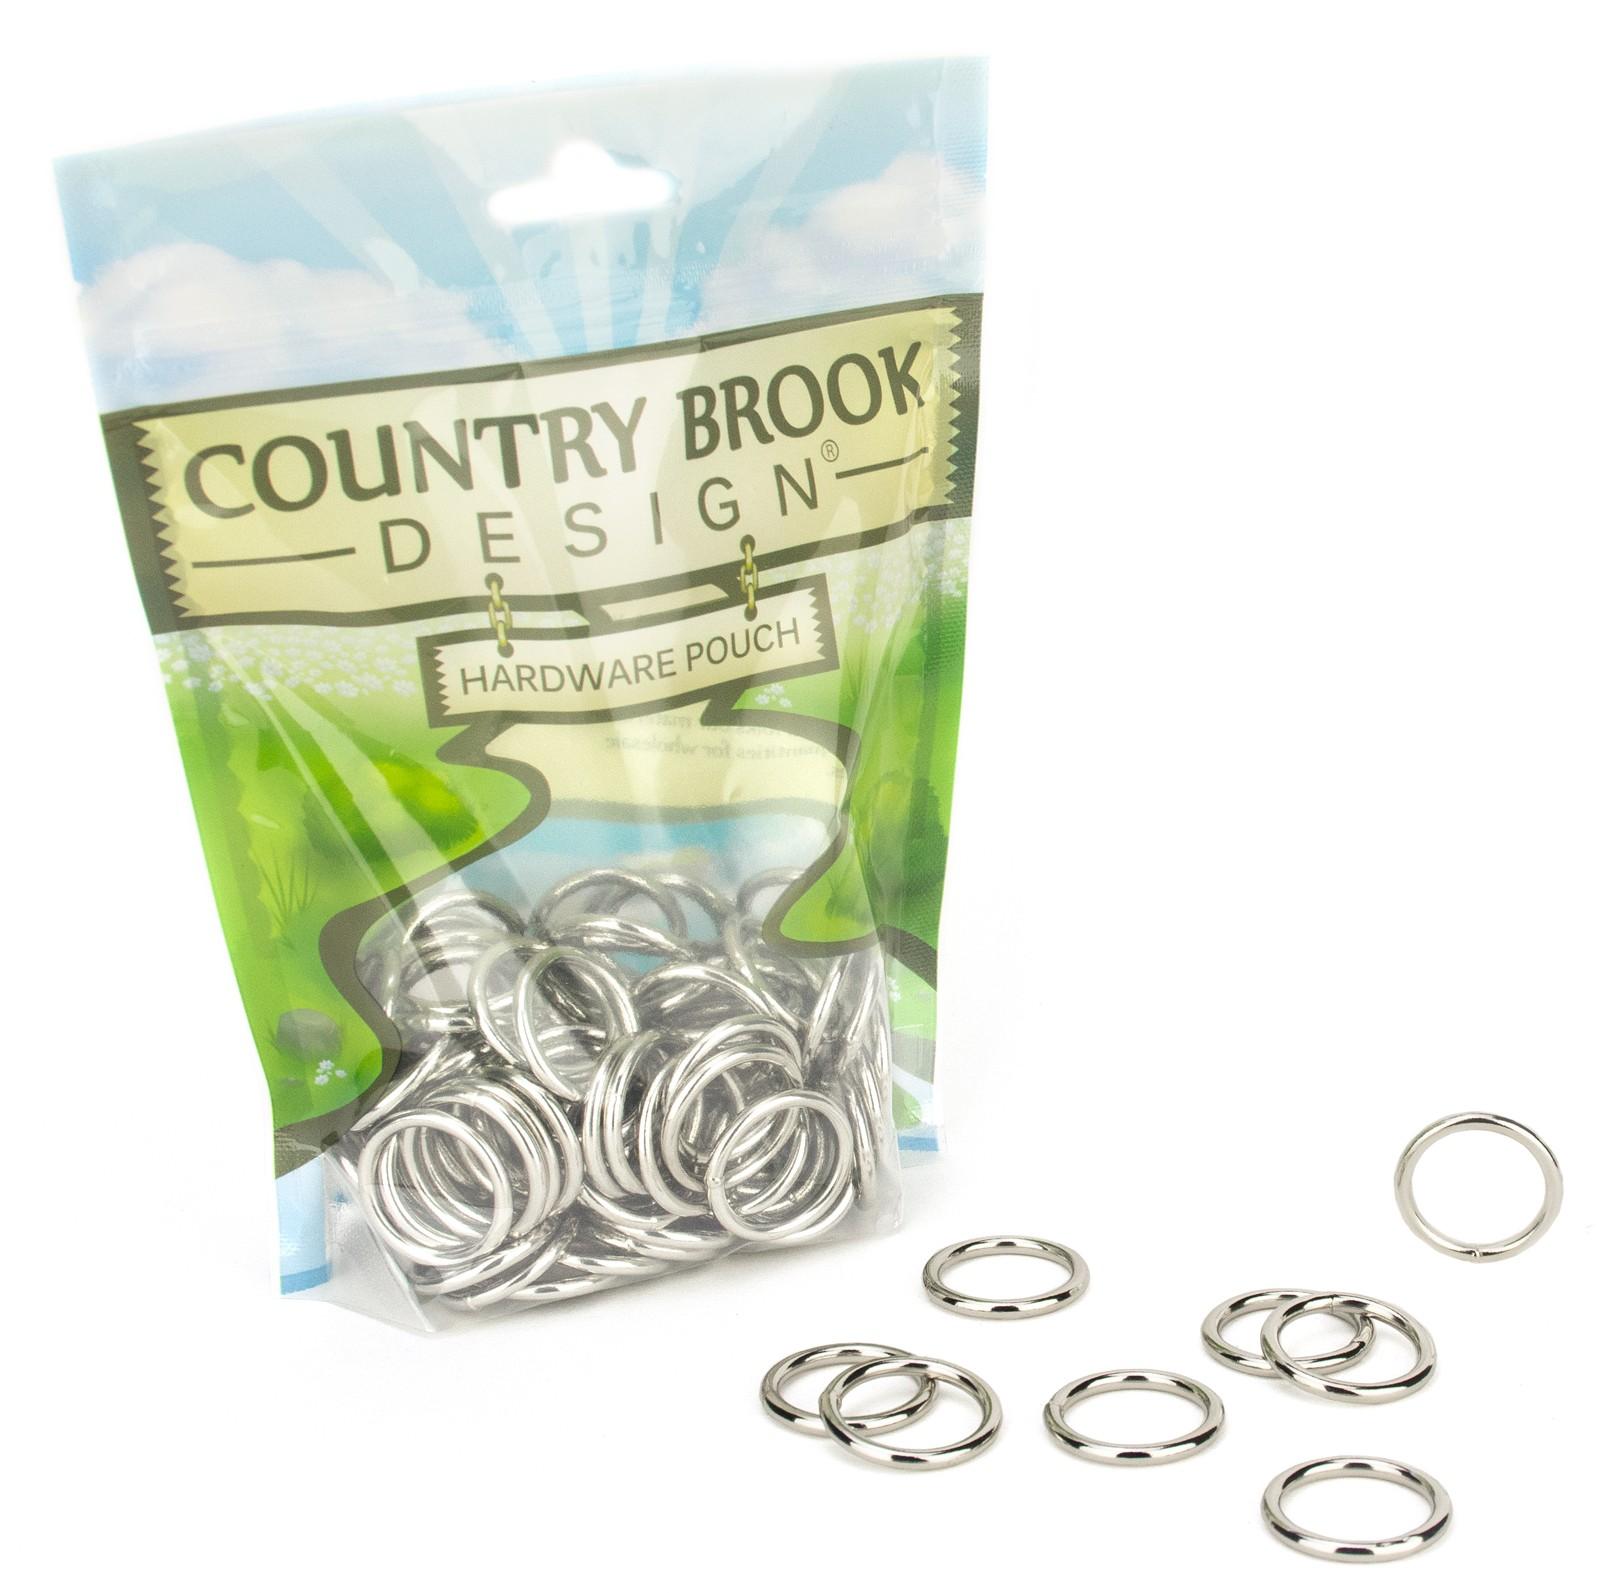 Buy Country Brook Design® 3/4 Inch Welded Lite O-Rings Online